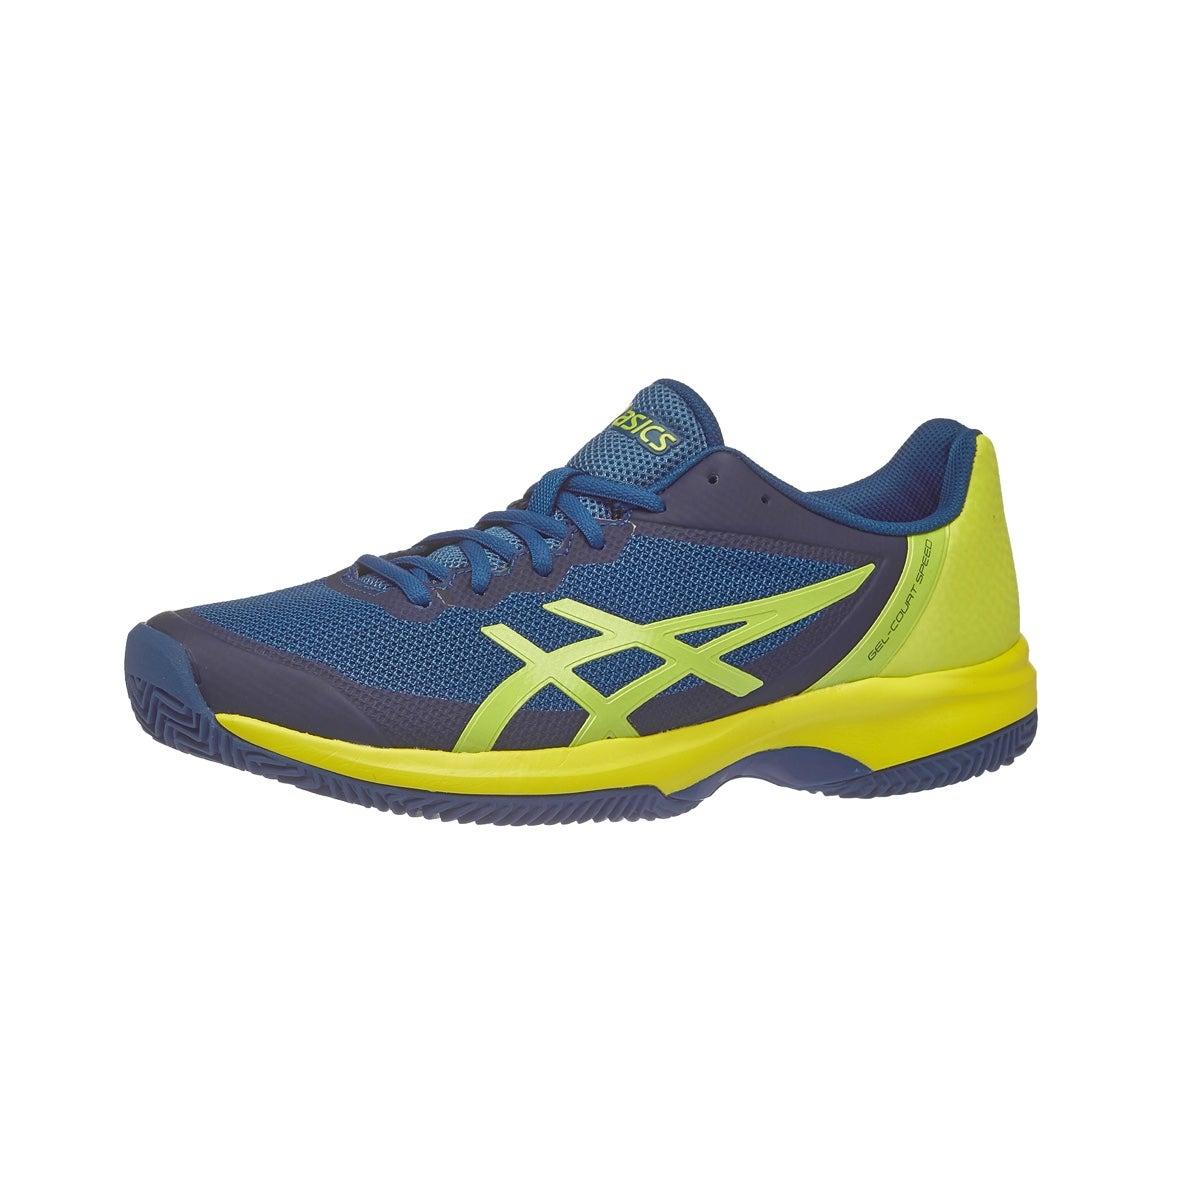 Chaussures Hommes Asics Gel Gel Court Speed Vue Bleu Court Argile/ Soufre 360 ° Vue 17de1a1 - sinetronindonesia.site